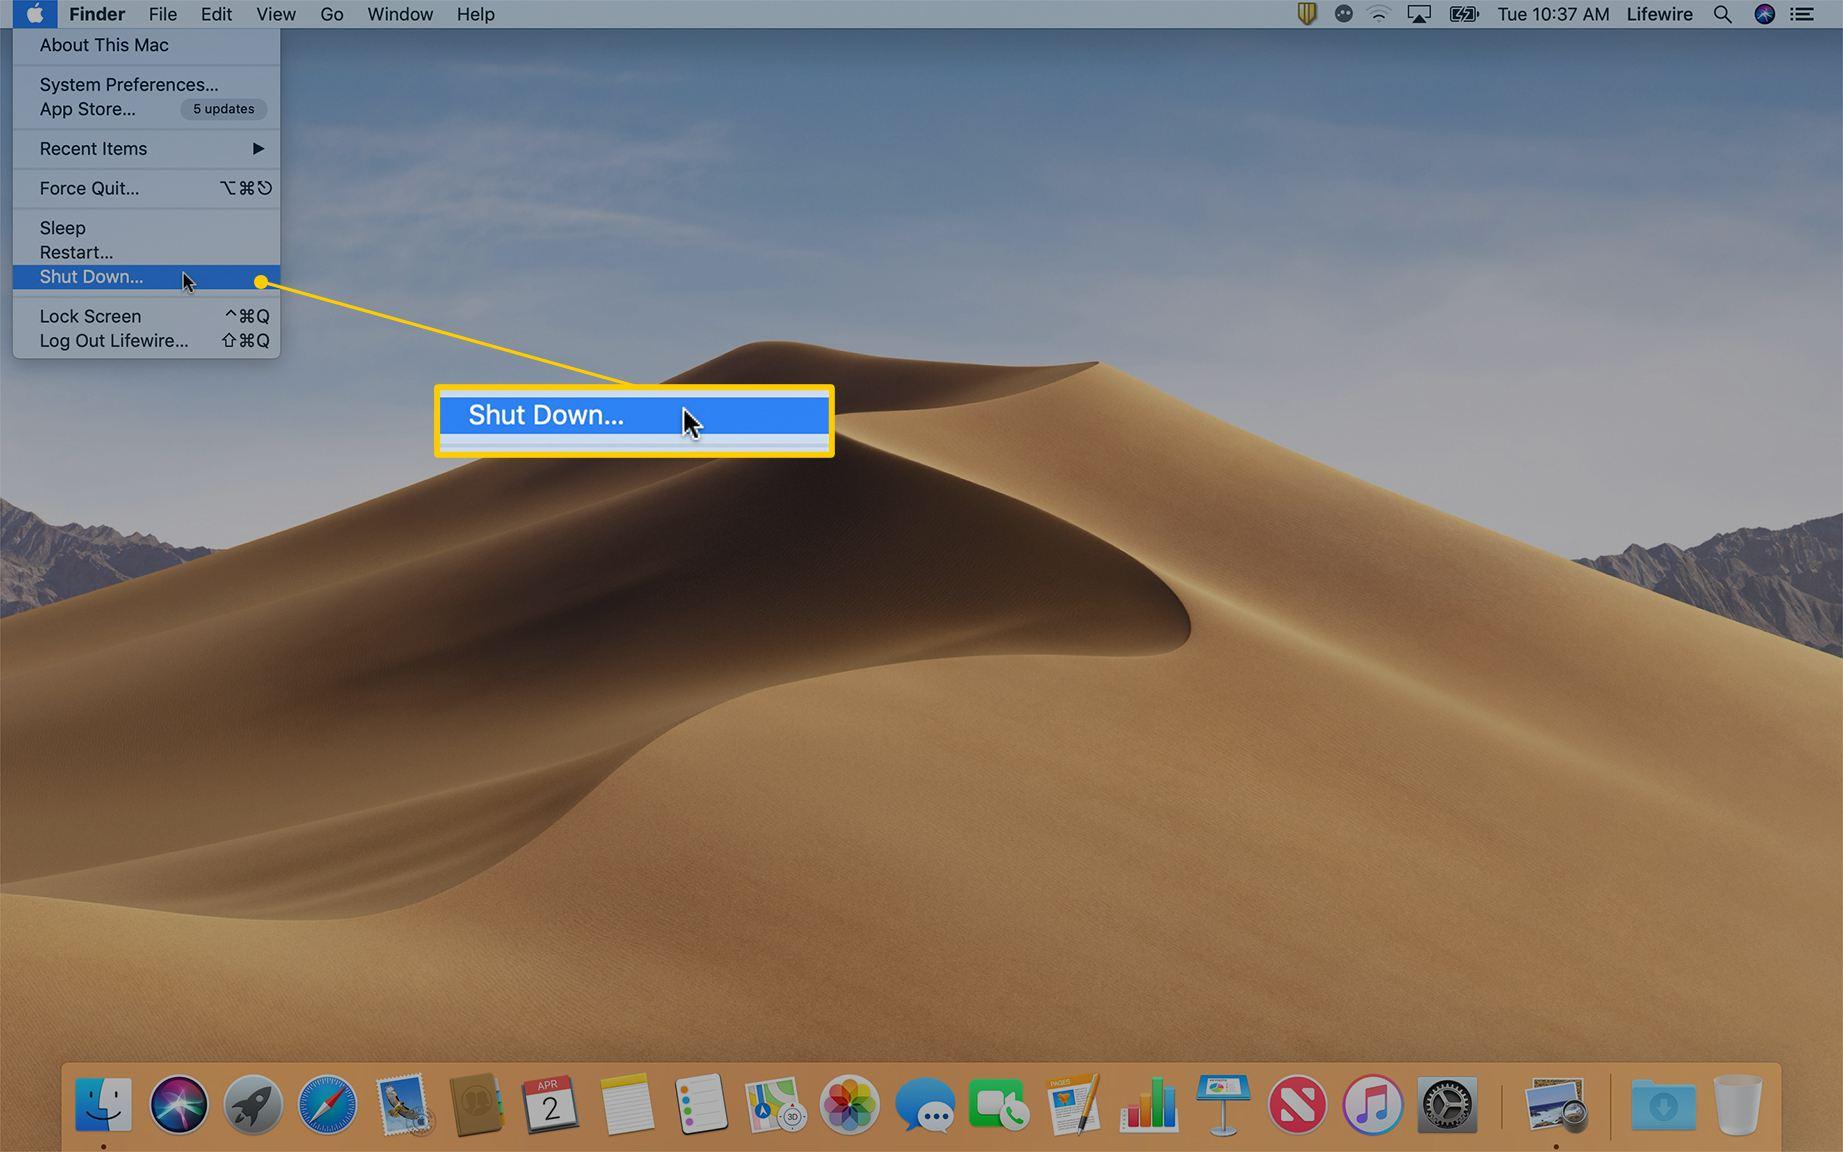 Shut Down option in Apple menu on macOS